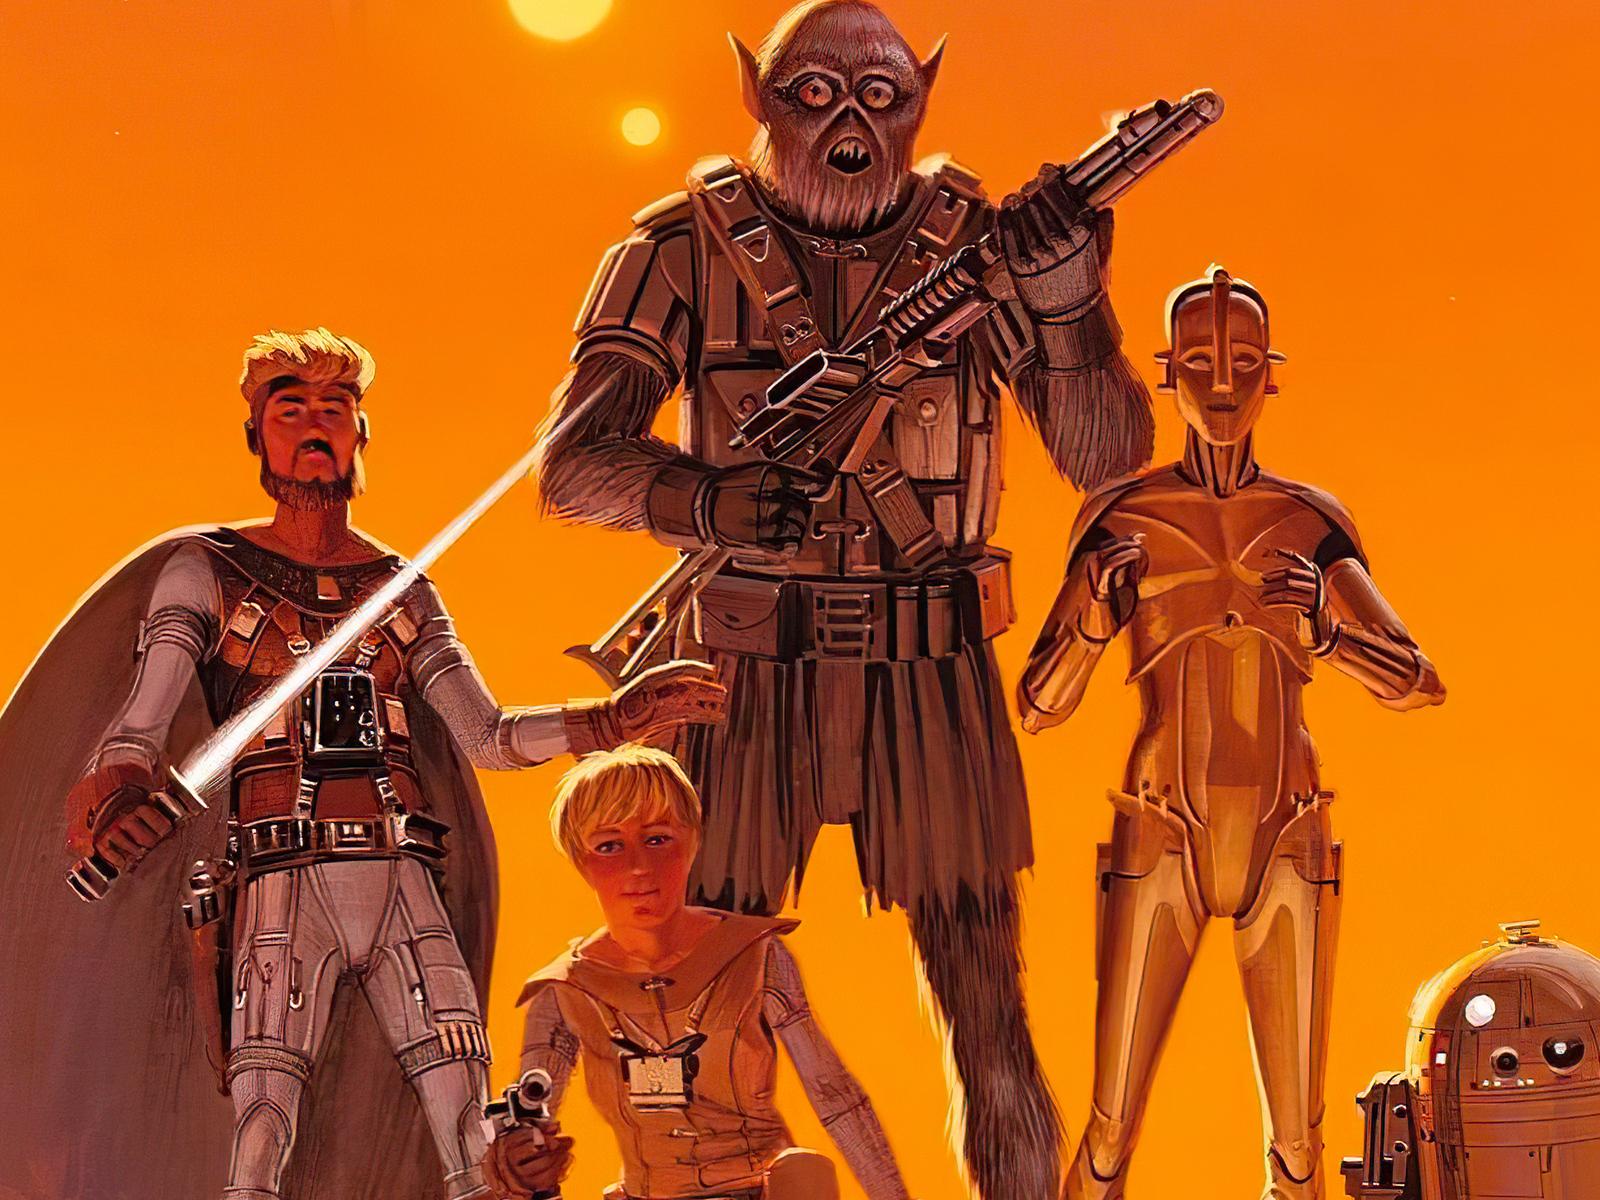 star-wars-concept-poster-art-4k-f7.jpg